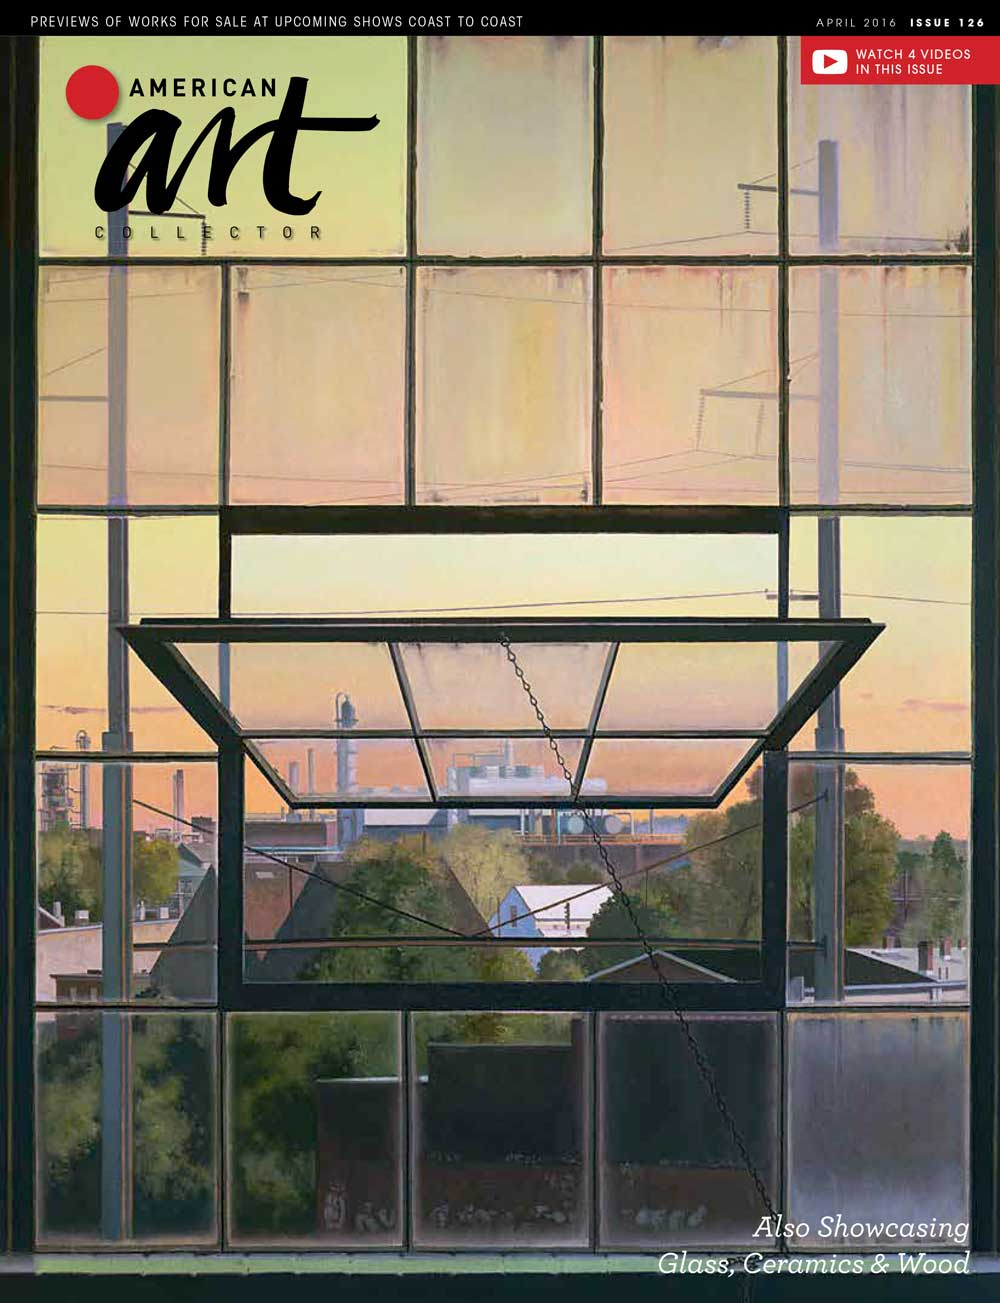 American Art Collector: April 2016